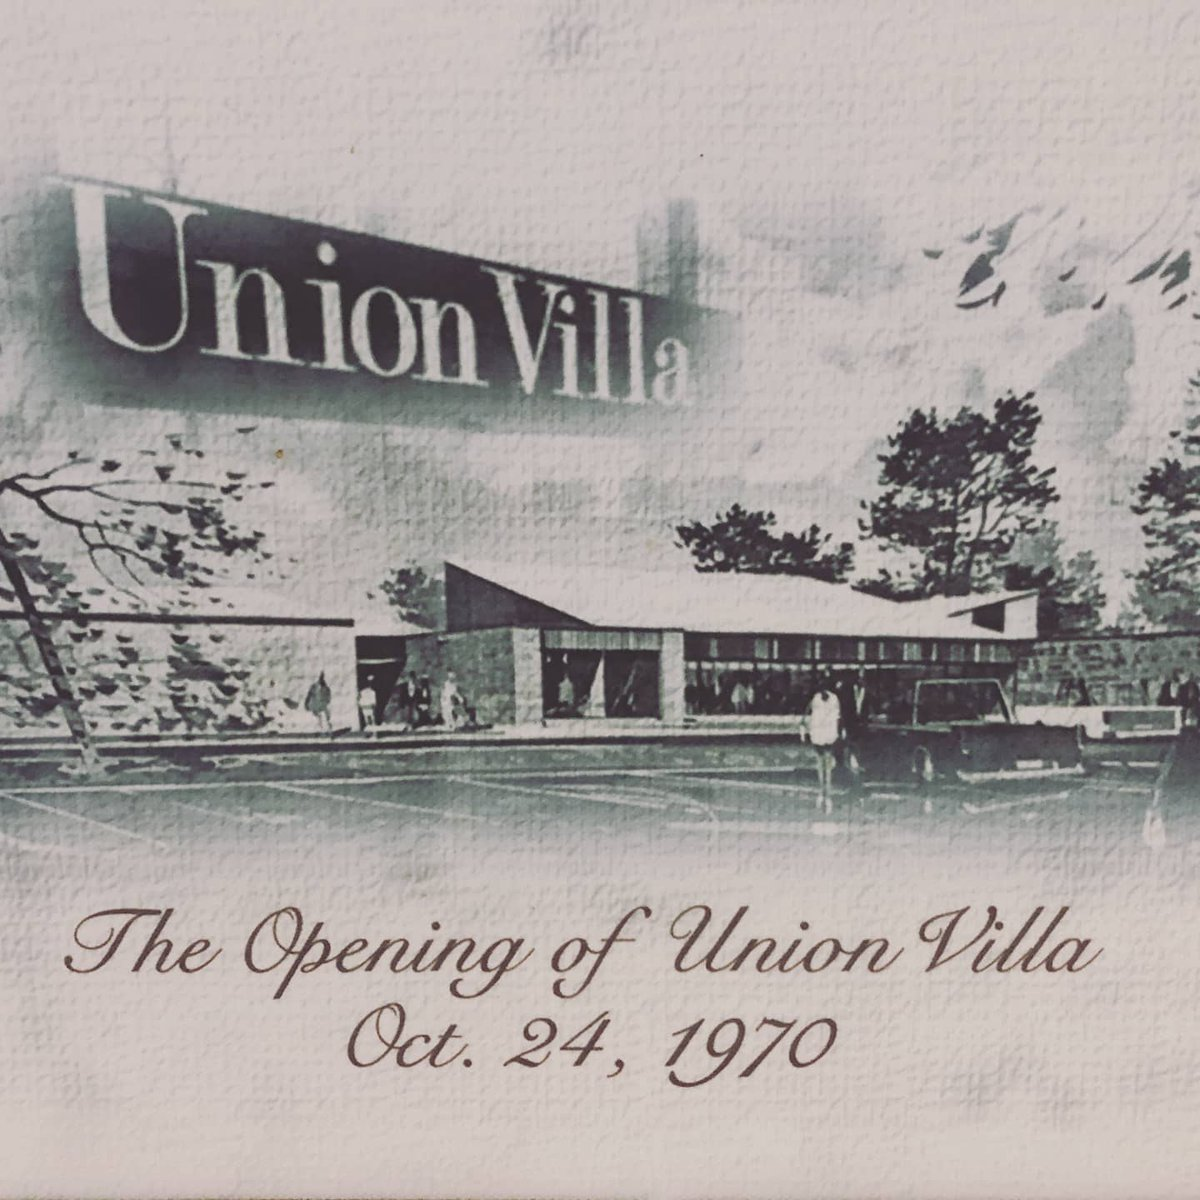 Congratulations on this milestone achievement. Happy 50th birthday, Union Villa! 🎂🎊 #happybirthday #happy50thbirthday #happy50thanniversary #goldenanniversary #milestonebirthday #longtermcare #LTC #frontlineworkers #healthcareheroes #unionville #markham #unionvilla https://t.co/z4XUDp3qt8